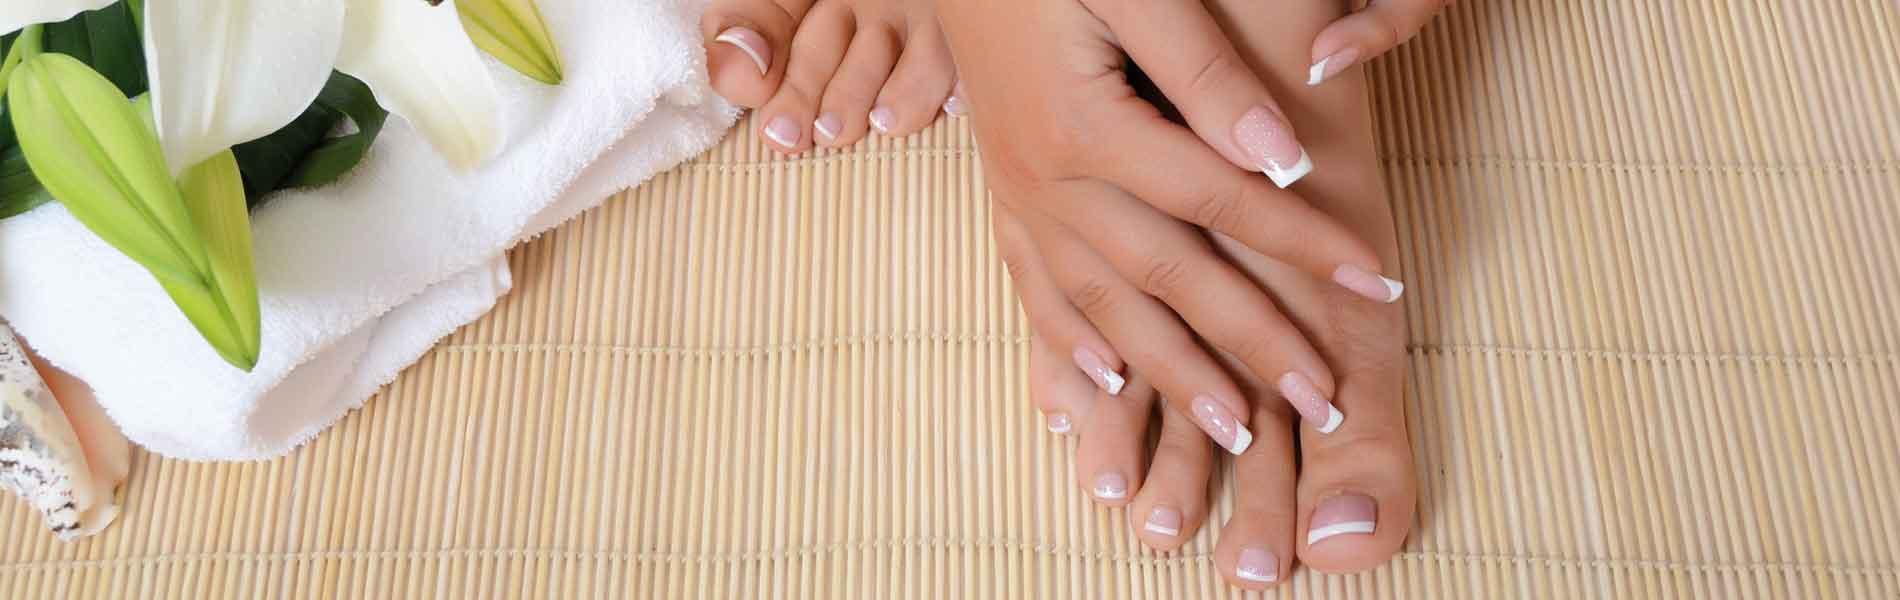 Maniküre & Pediküre - Nageldesign und Kosmetik